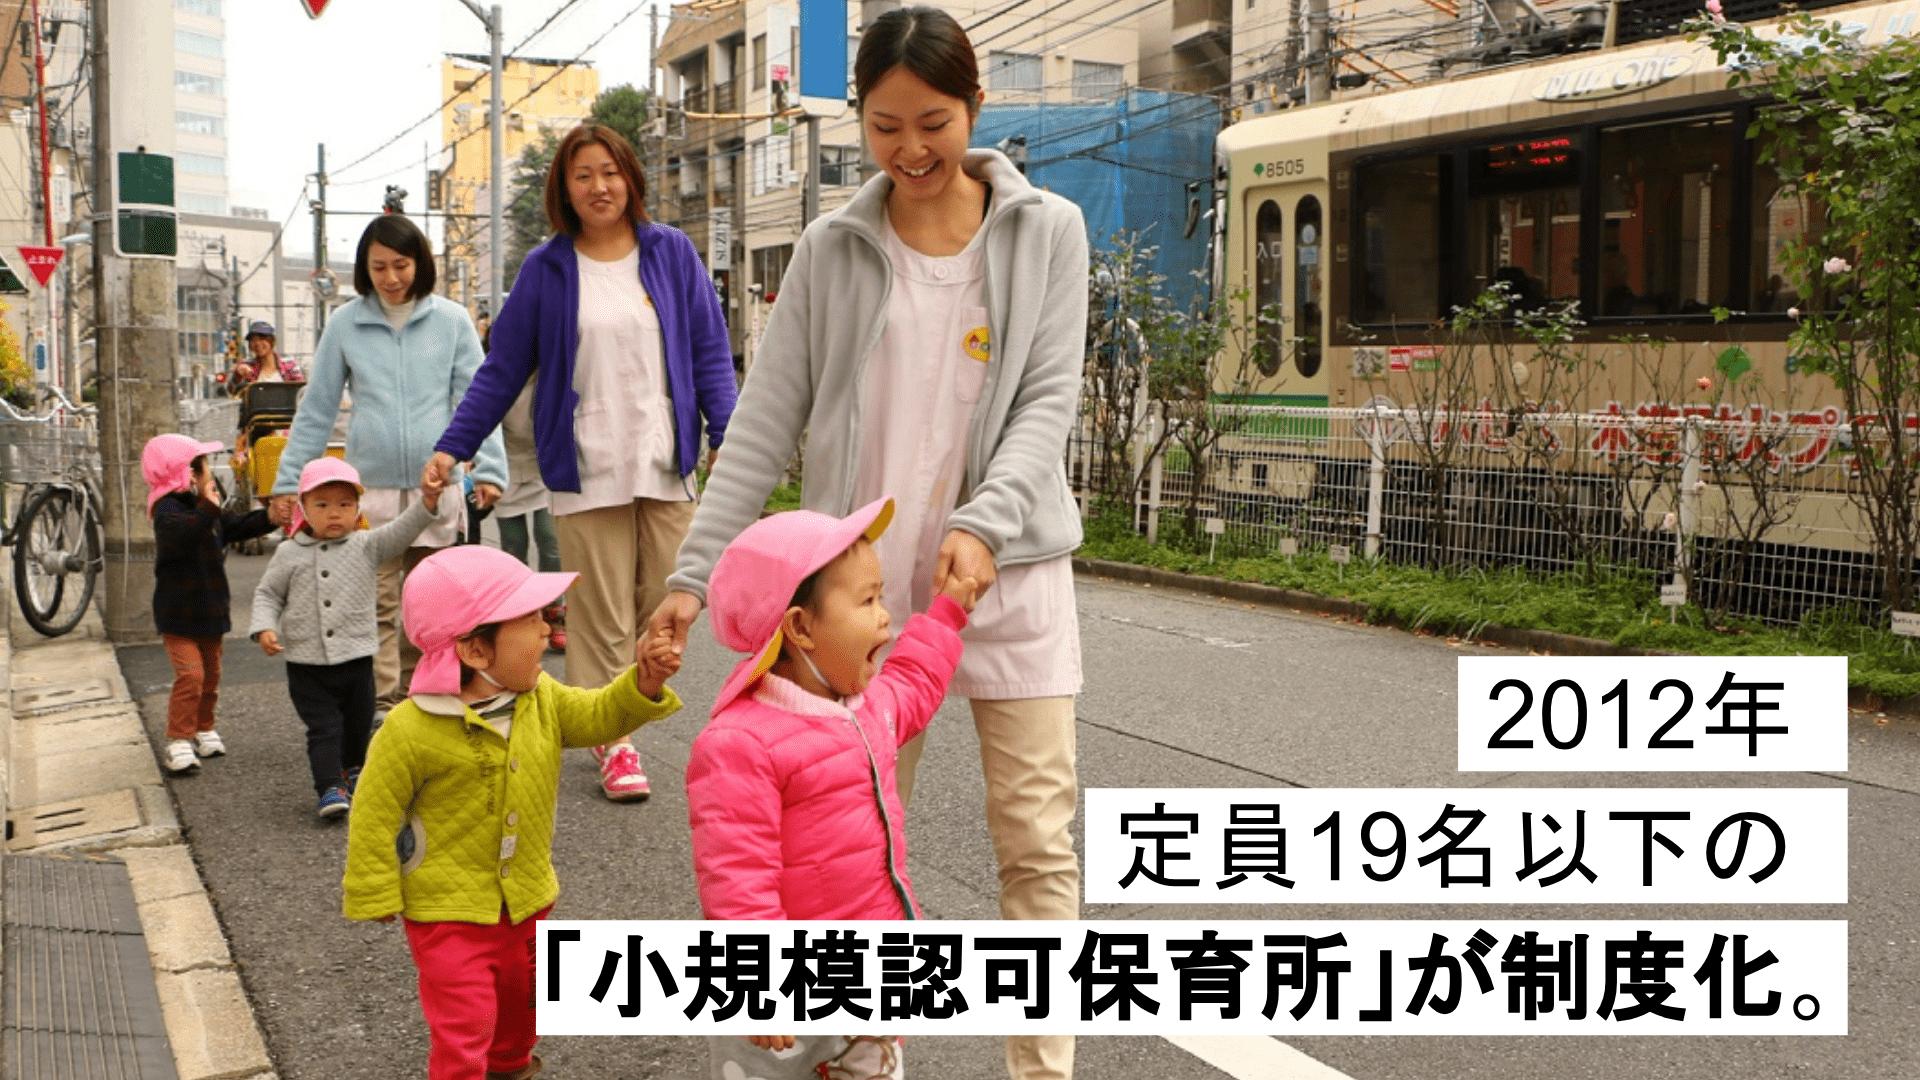 image1-min